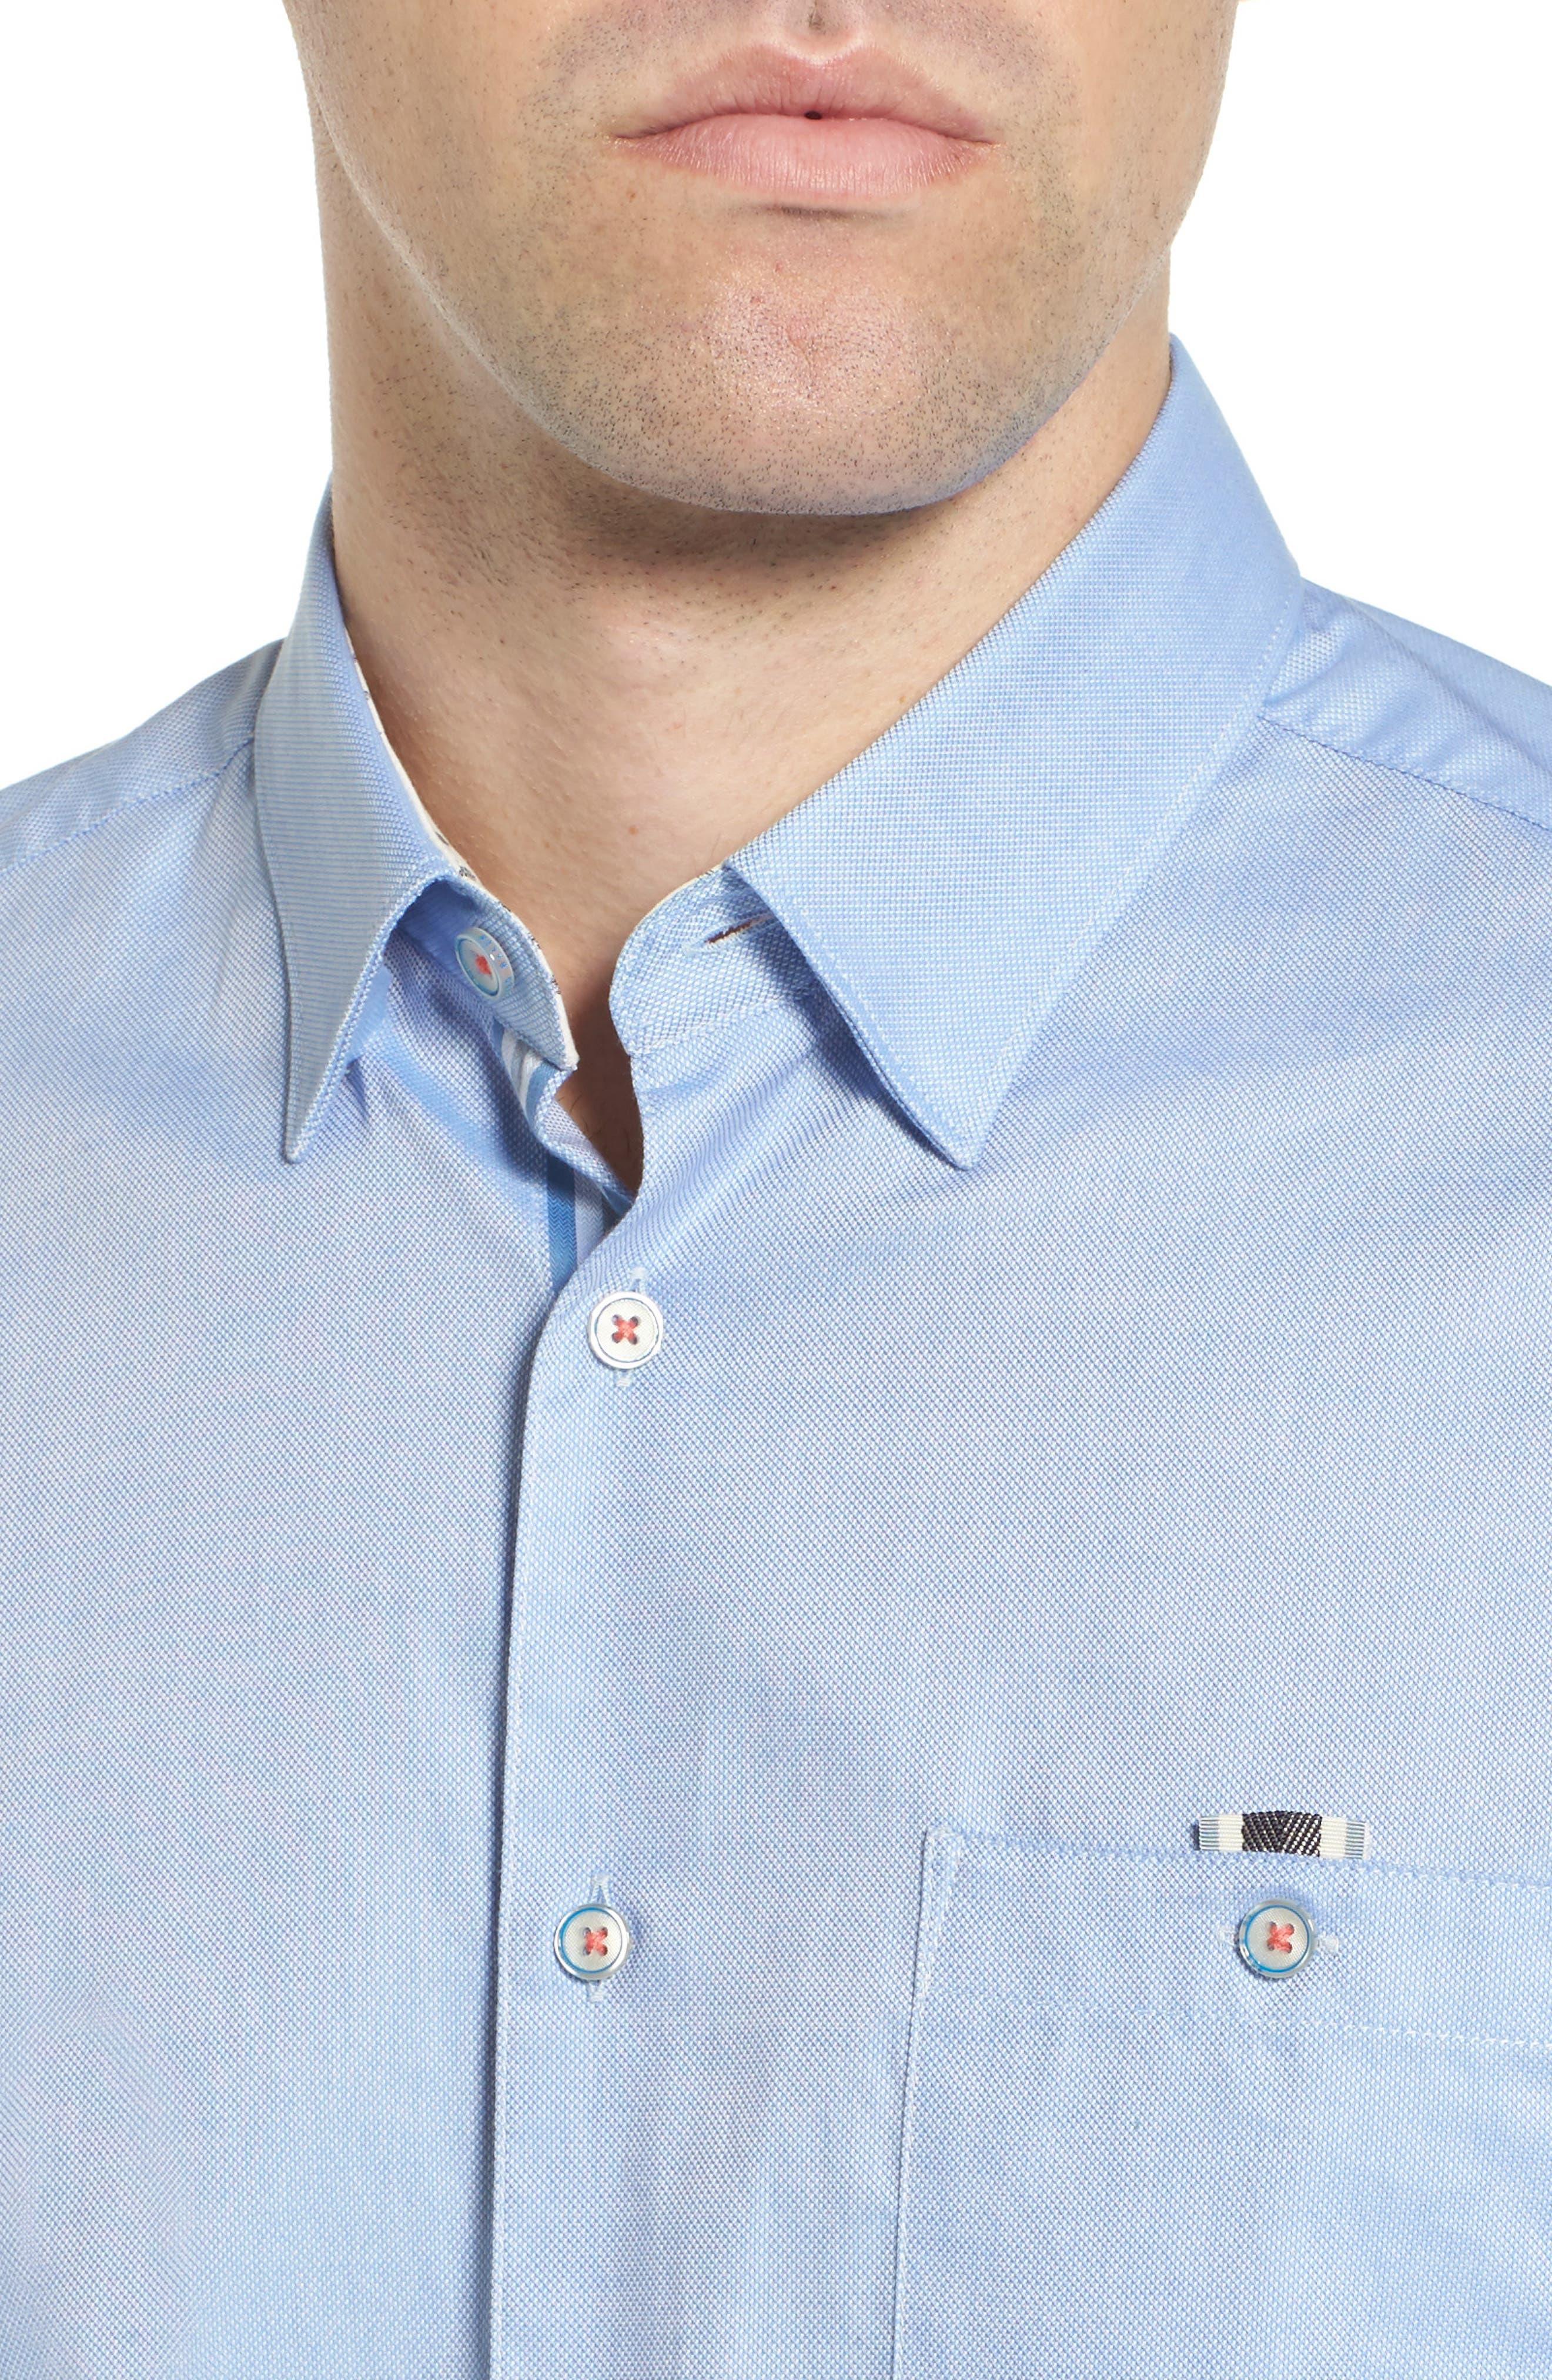 Wallott Extra Slim Fit Short Sleeve Sport Shirt,                             Alternate thumbnail 2, color,                             Blue